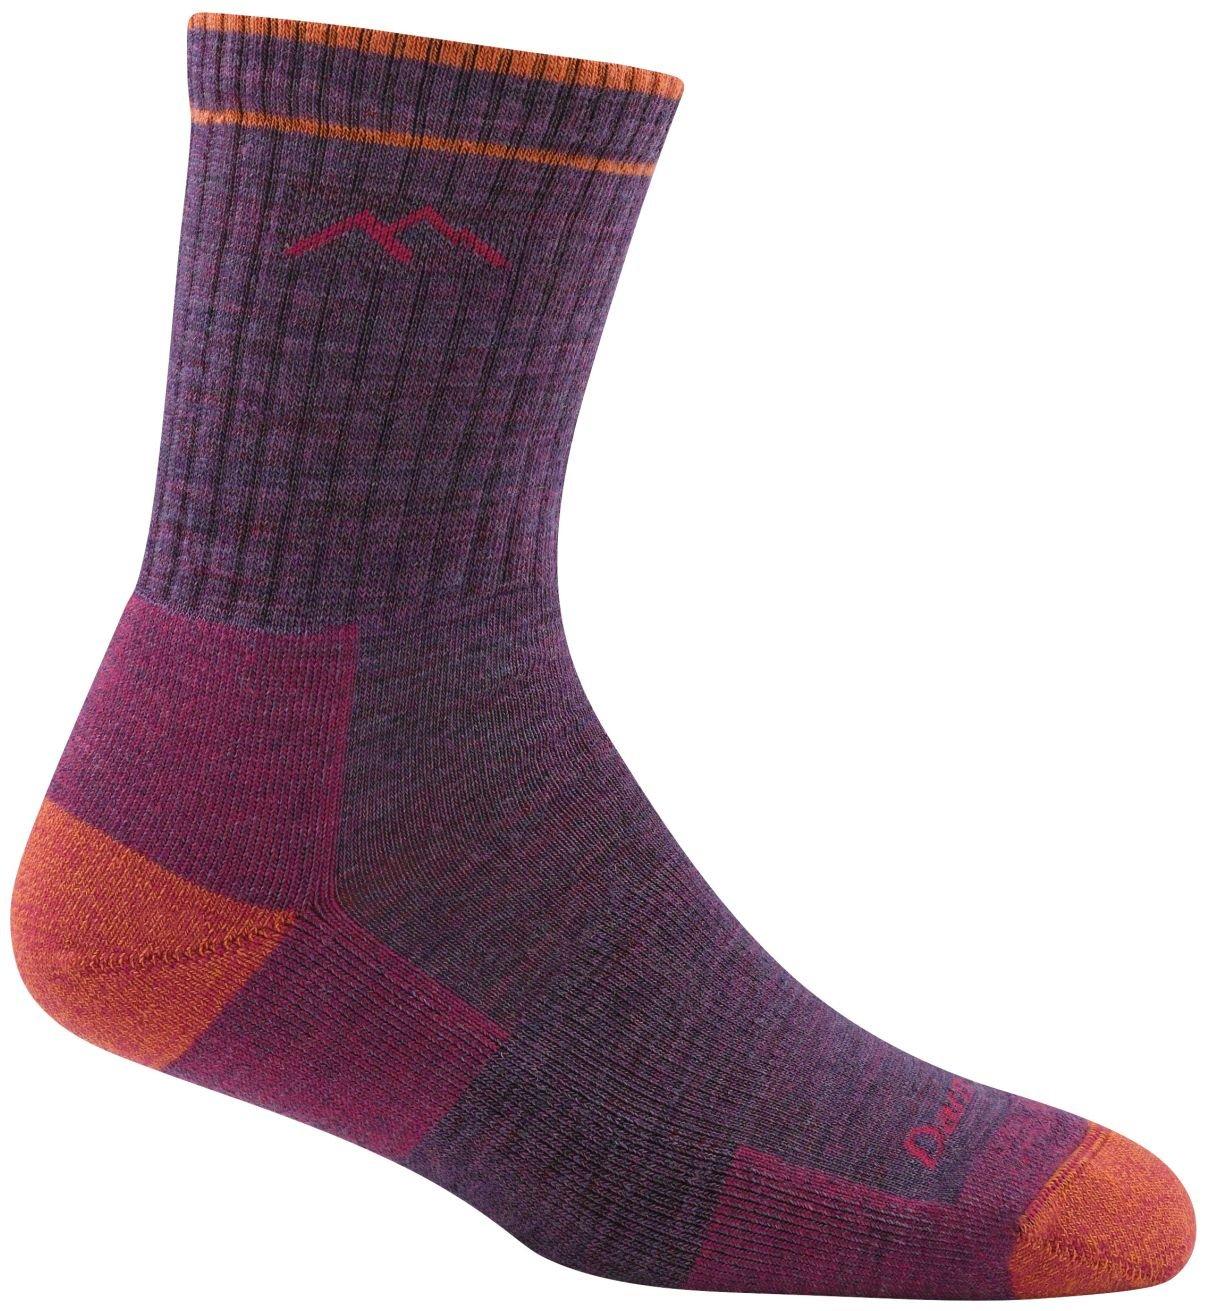 Darn Tough Hiker Micro Crew Cushion Socks - Women's Plum Heather Small by Darn Tough